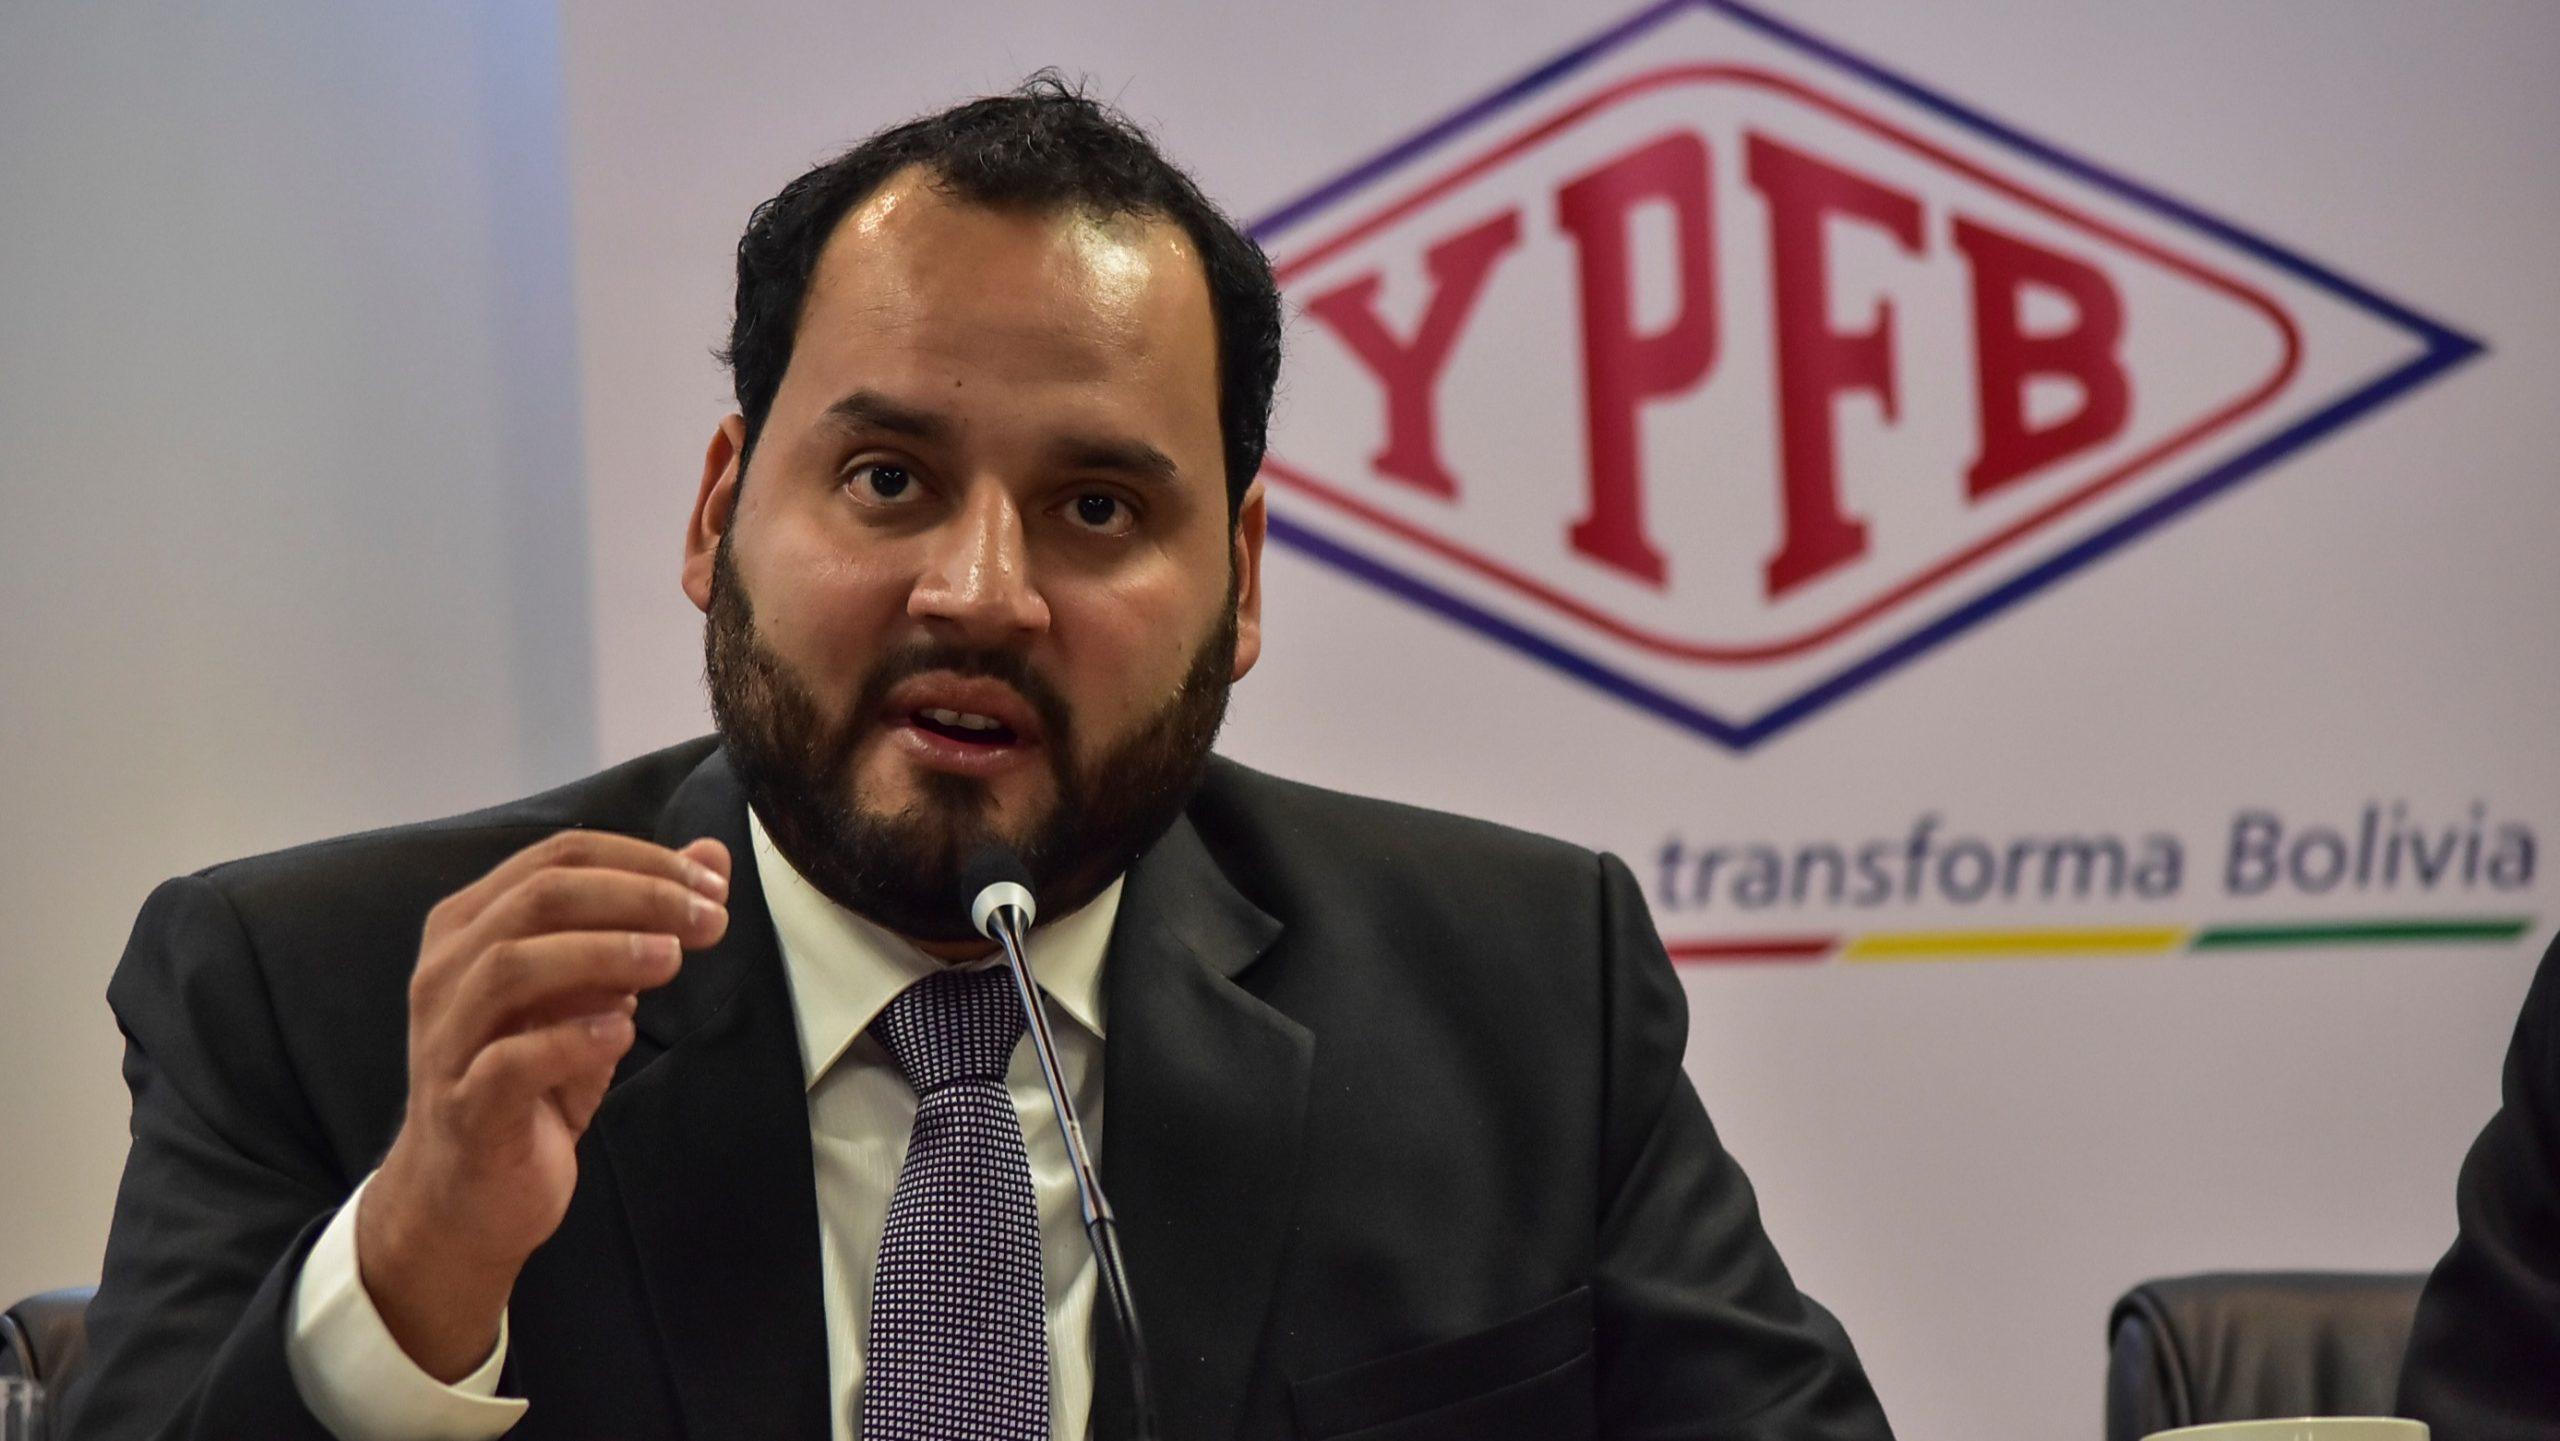 Activan alerta migratoria contra expresidente de YPFB